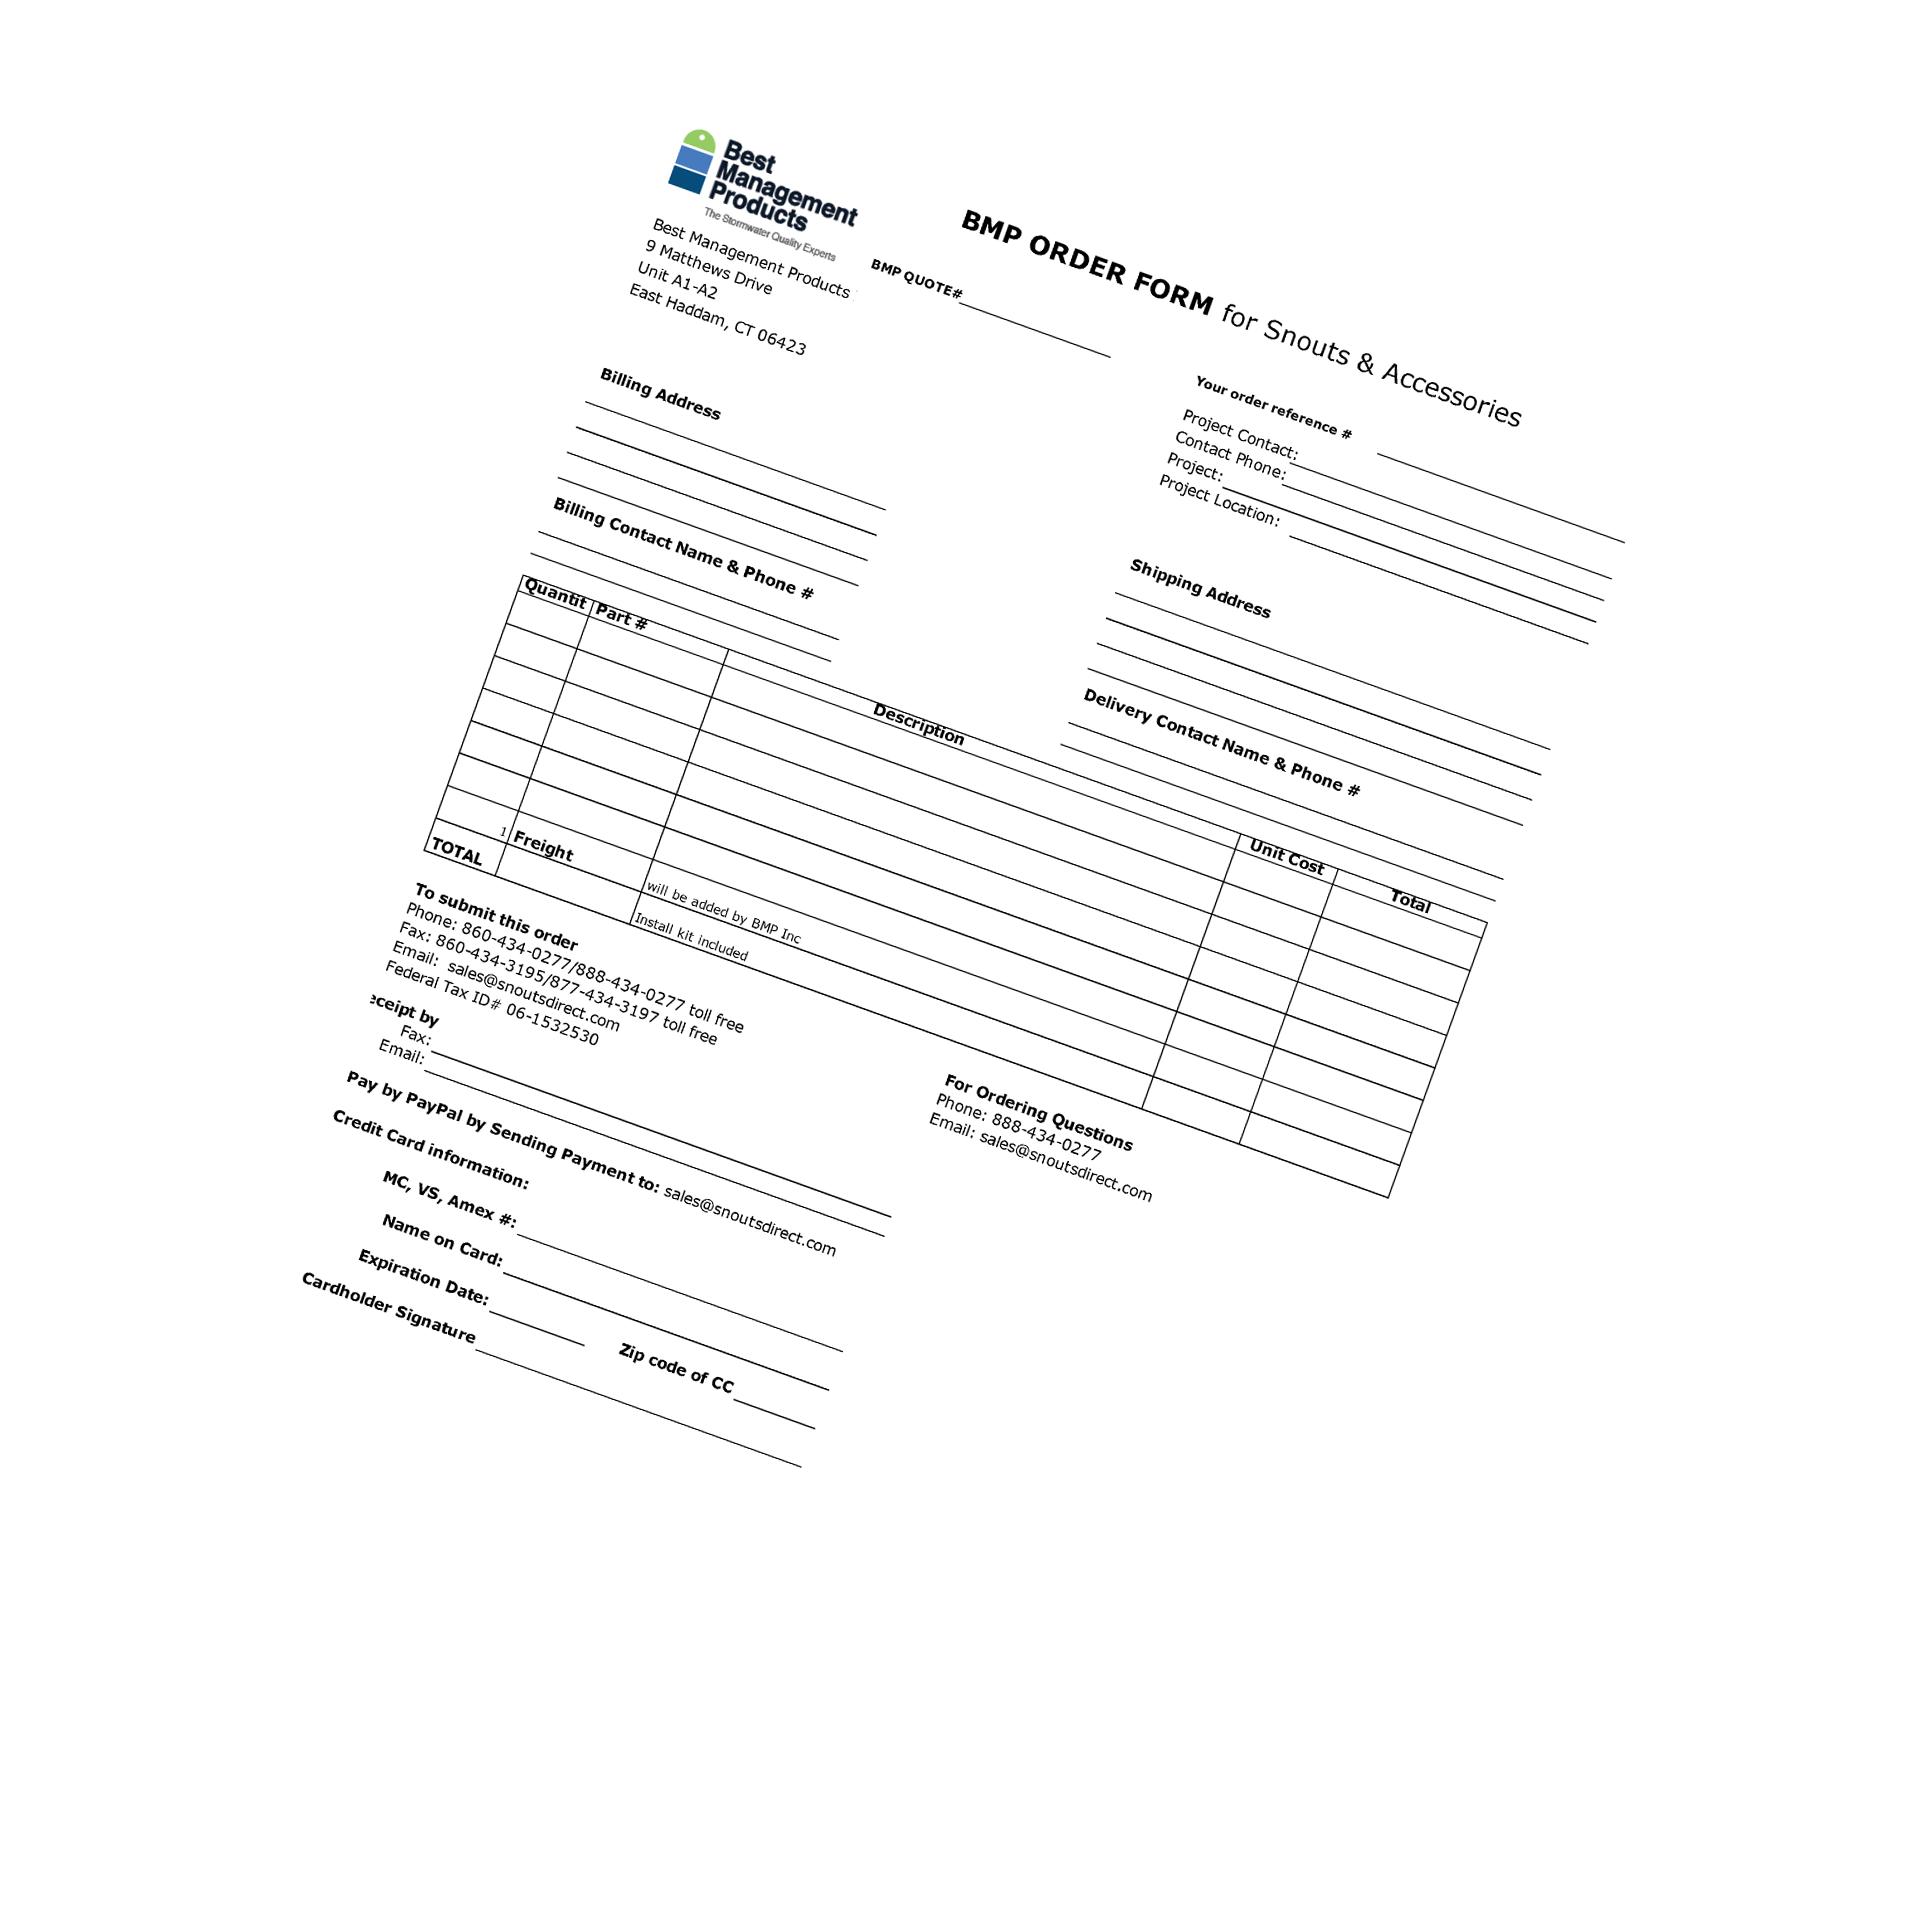 Macbook with a screenshot of SNOUTs Direct online ordering website